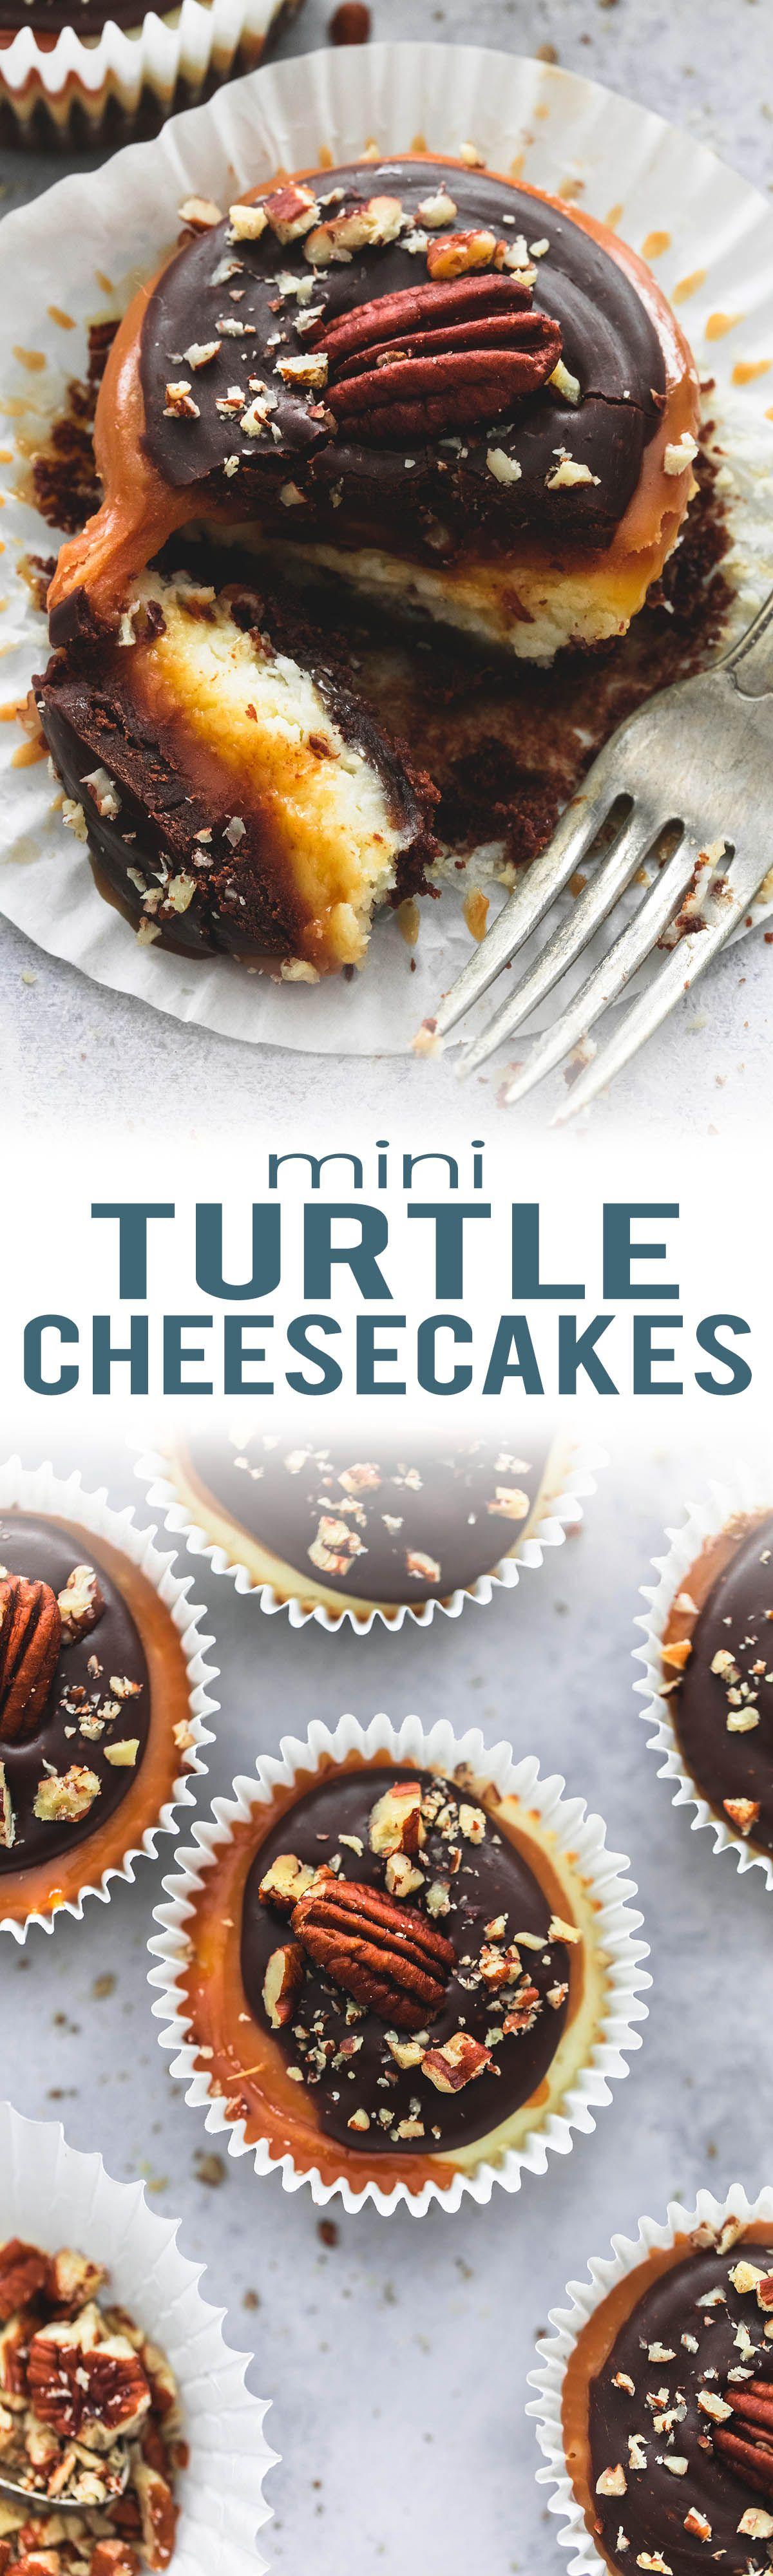 Easy homemade mini turtle cheesecake recipe with a brownie